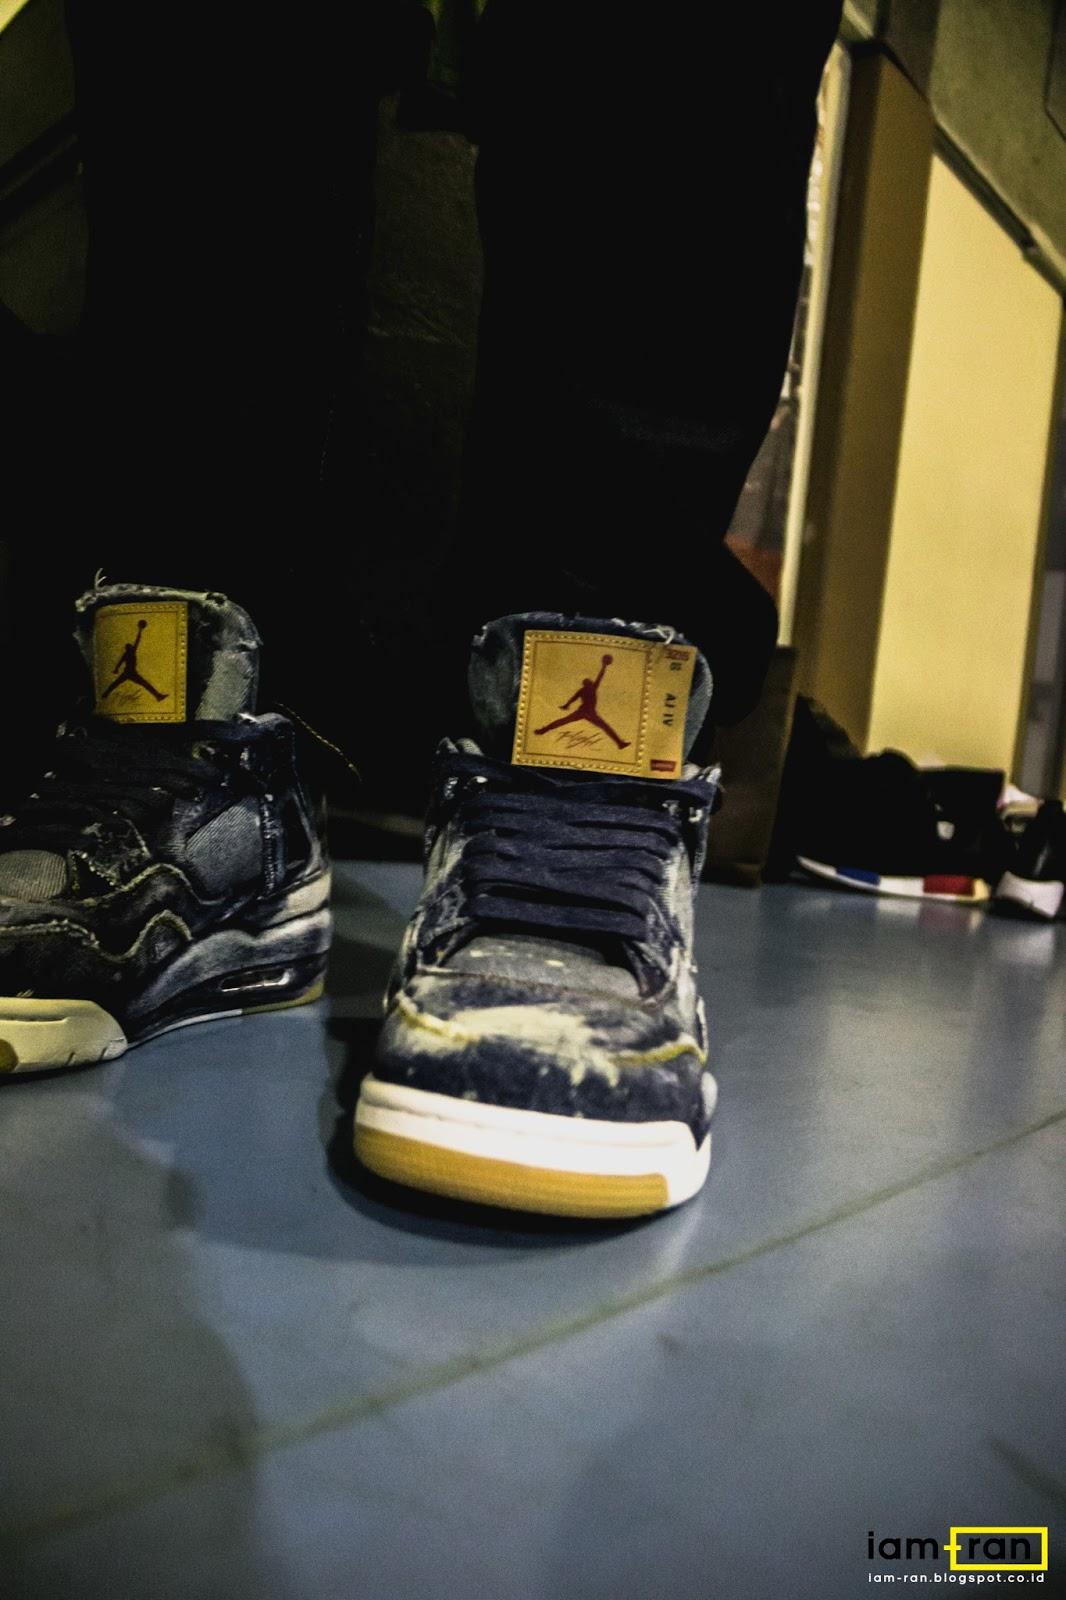 6dd89f2cadf Sneakers : Nike Air Jordan 4 X Levis. Photo by : iam.ran06